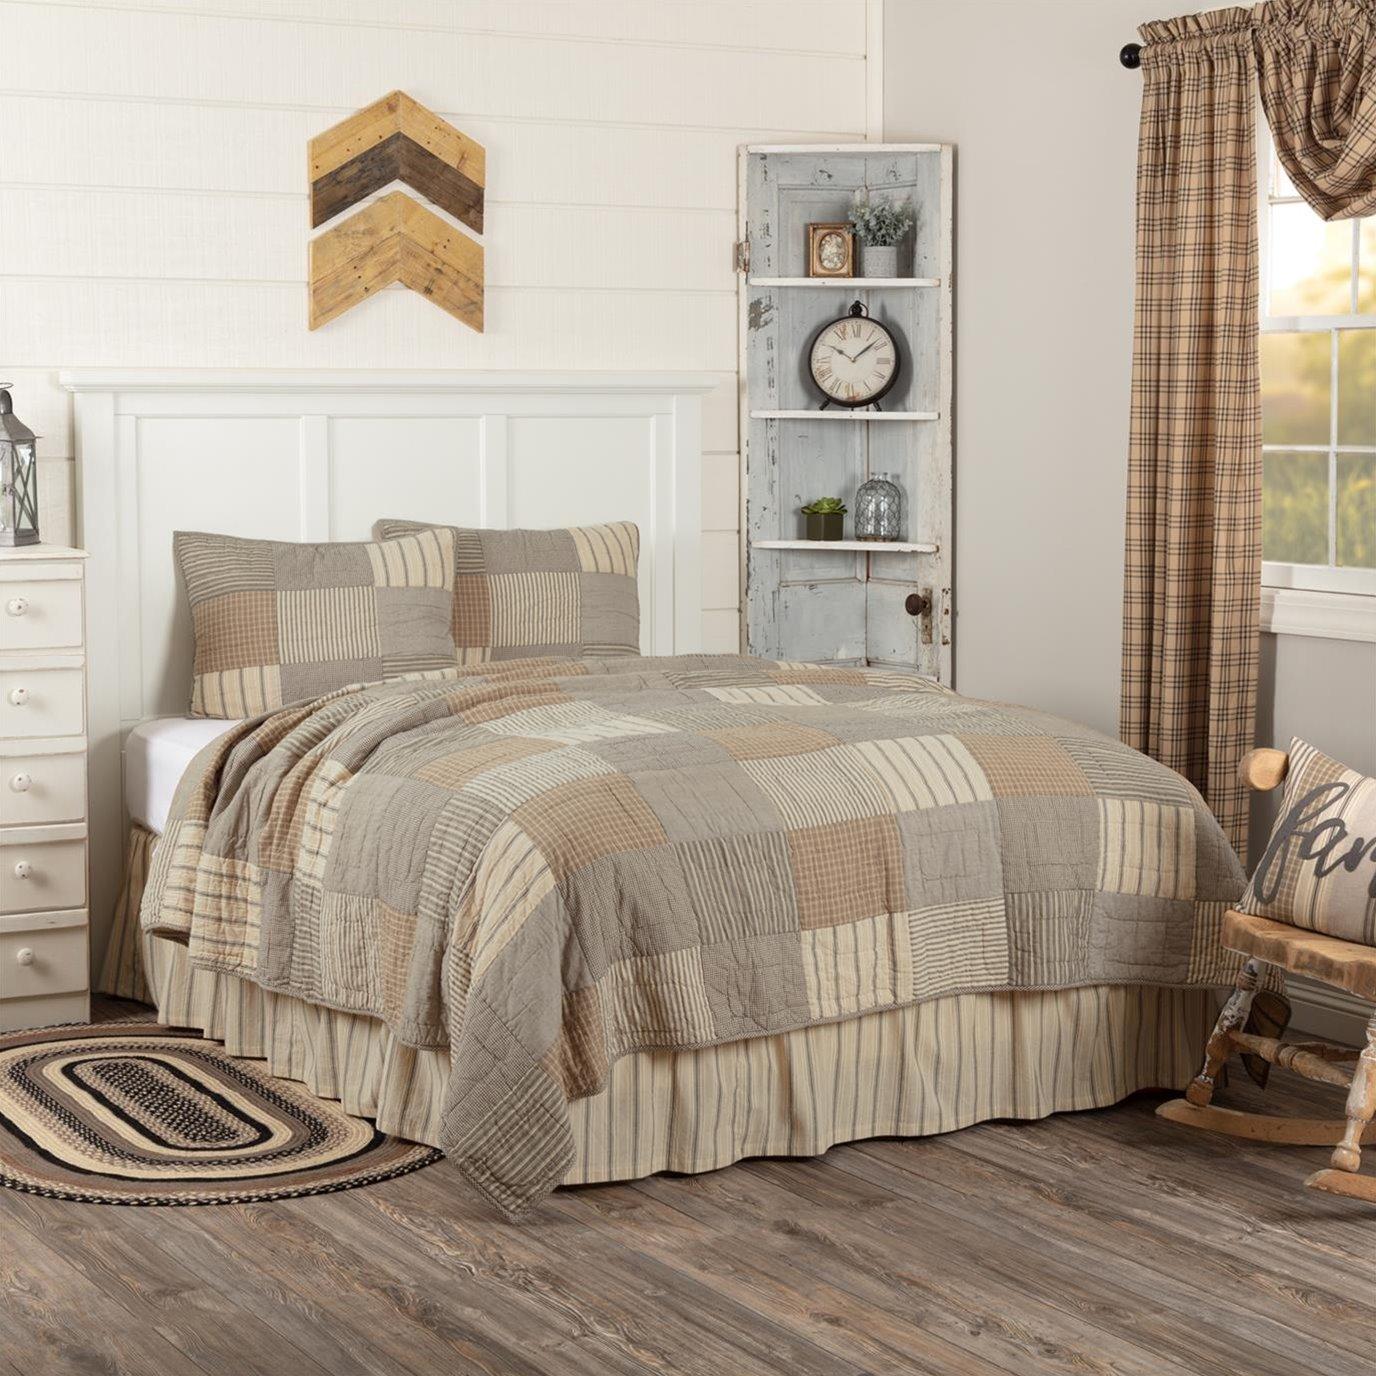 Sawyer Mill Charcoal Queen Quilt Set; 1-Quilt 90Wx90L w/2 Shams 21x27